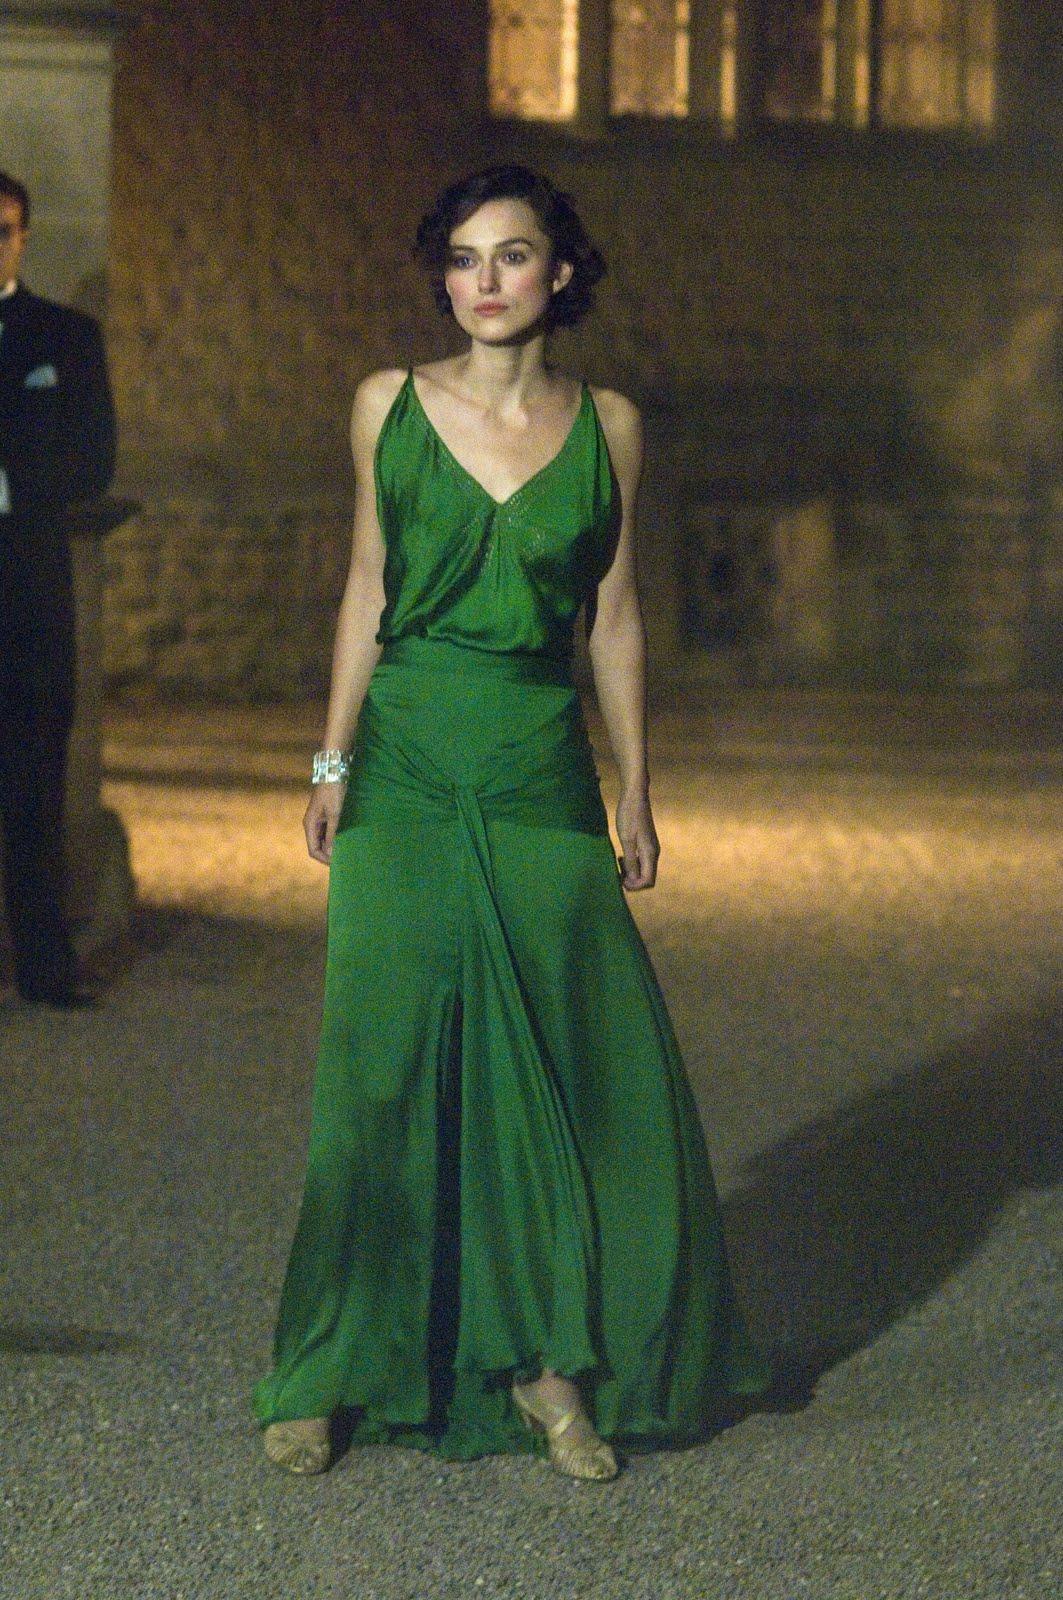 Keira Knightley Atonement Green